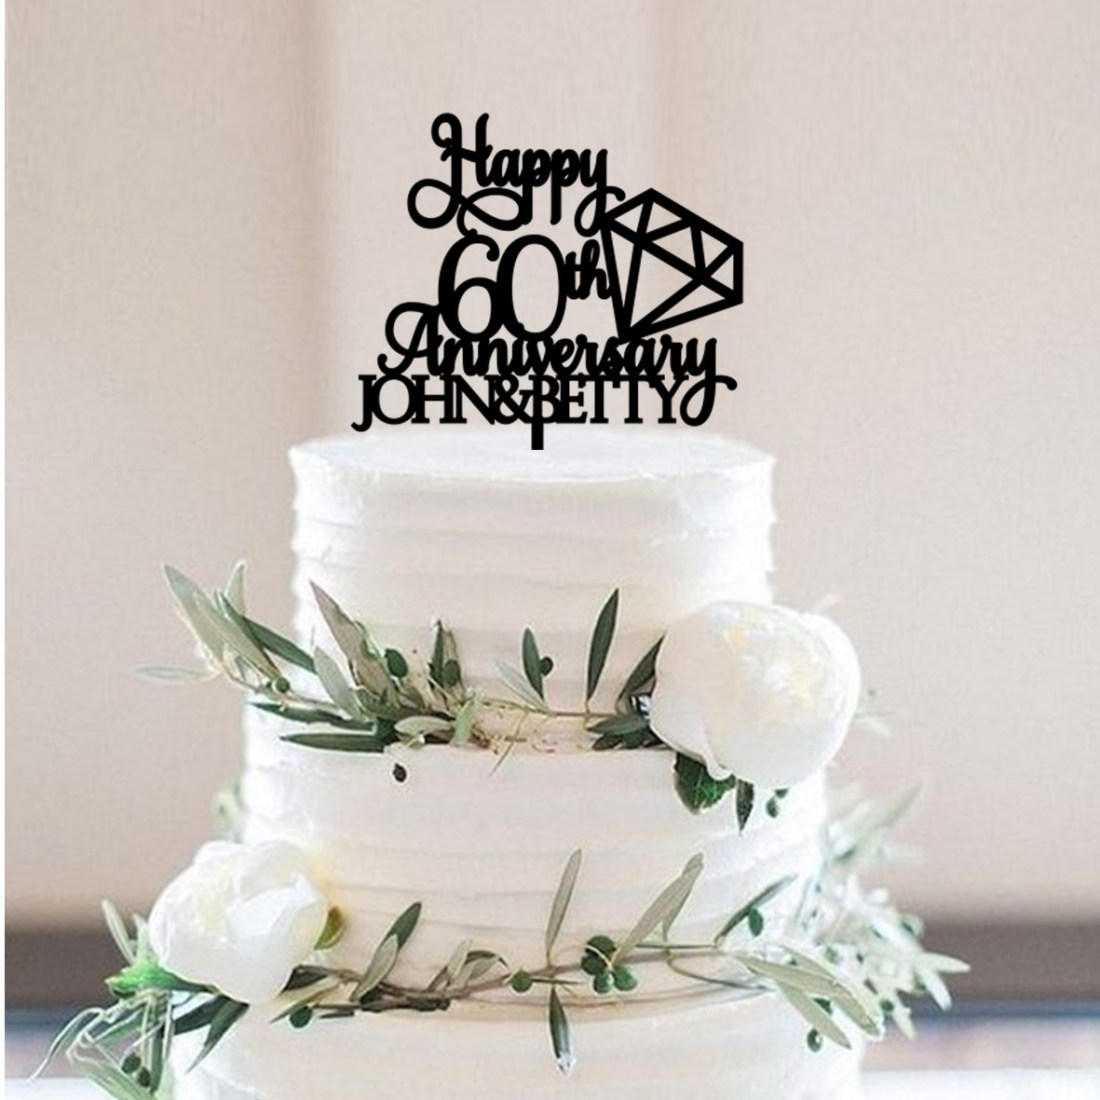 Happy 60th Diamond Wedding Anniversary Personalised Cake Topper